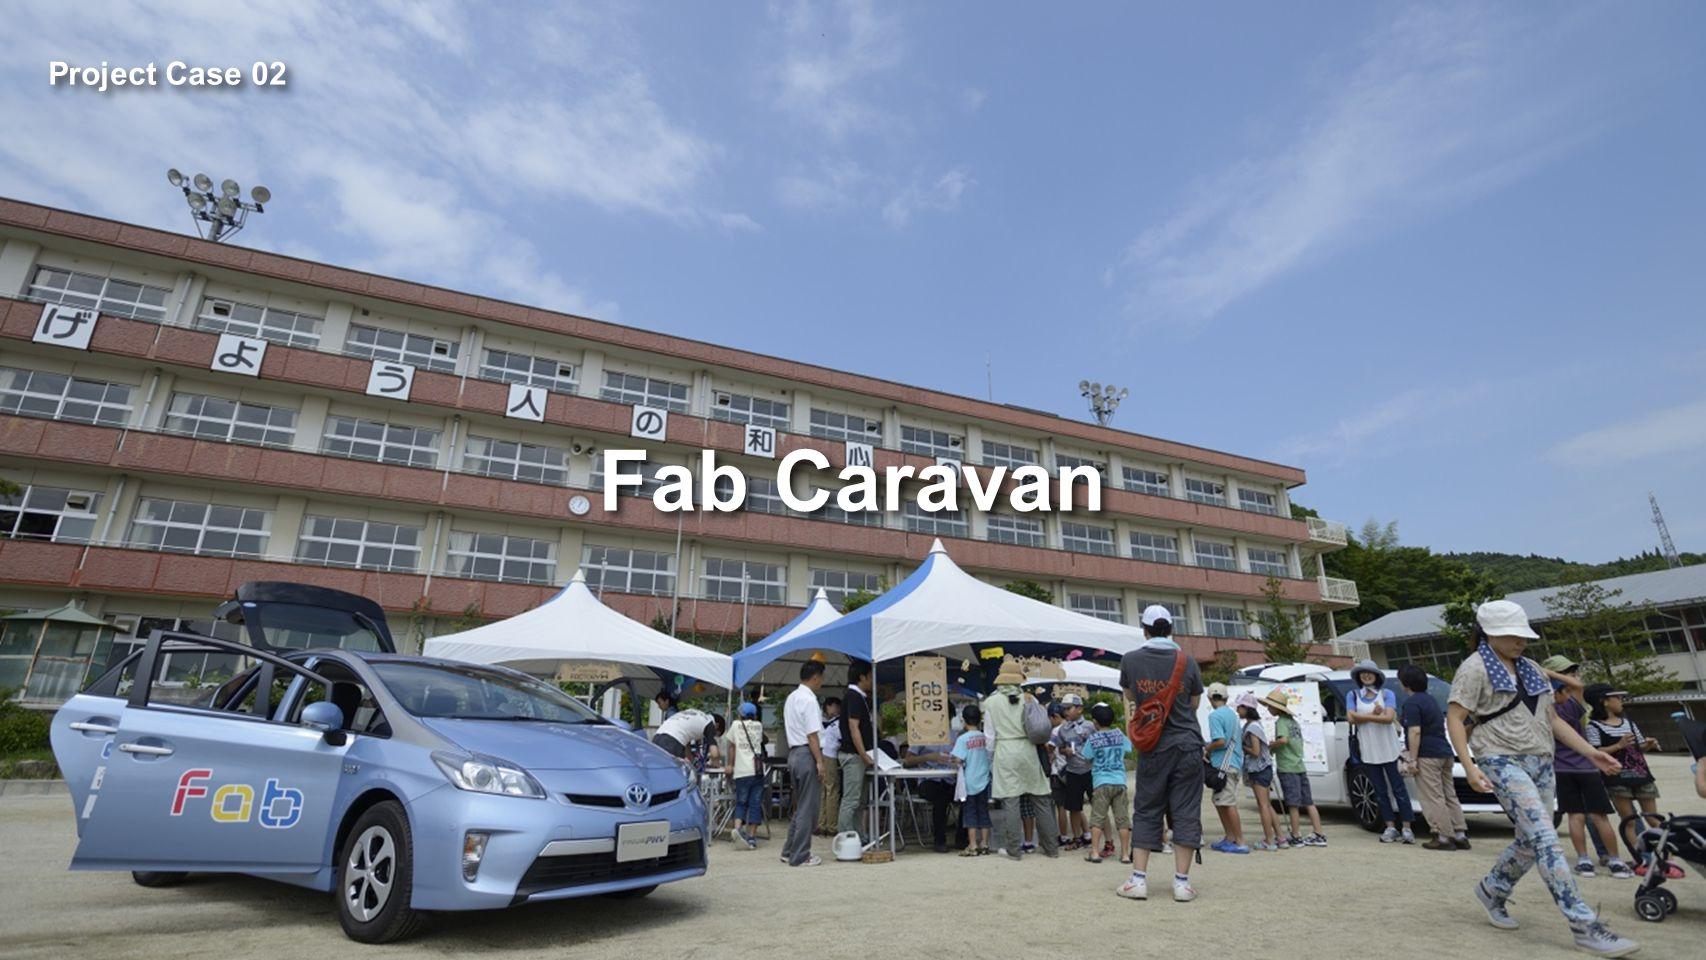 Fab Caravan Project Case 02